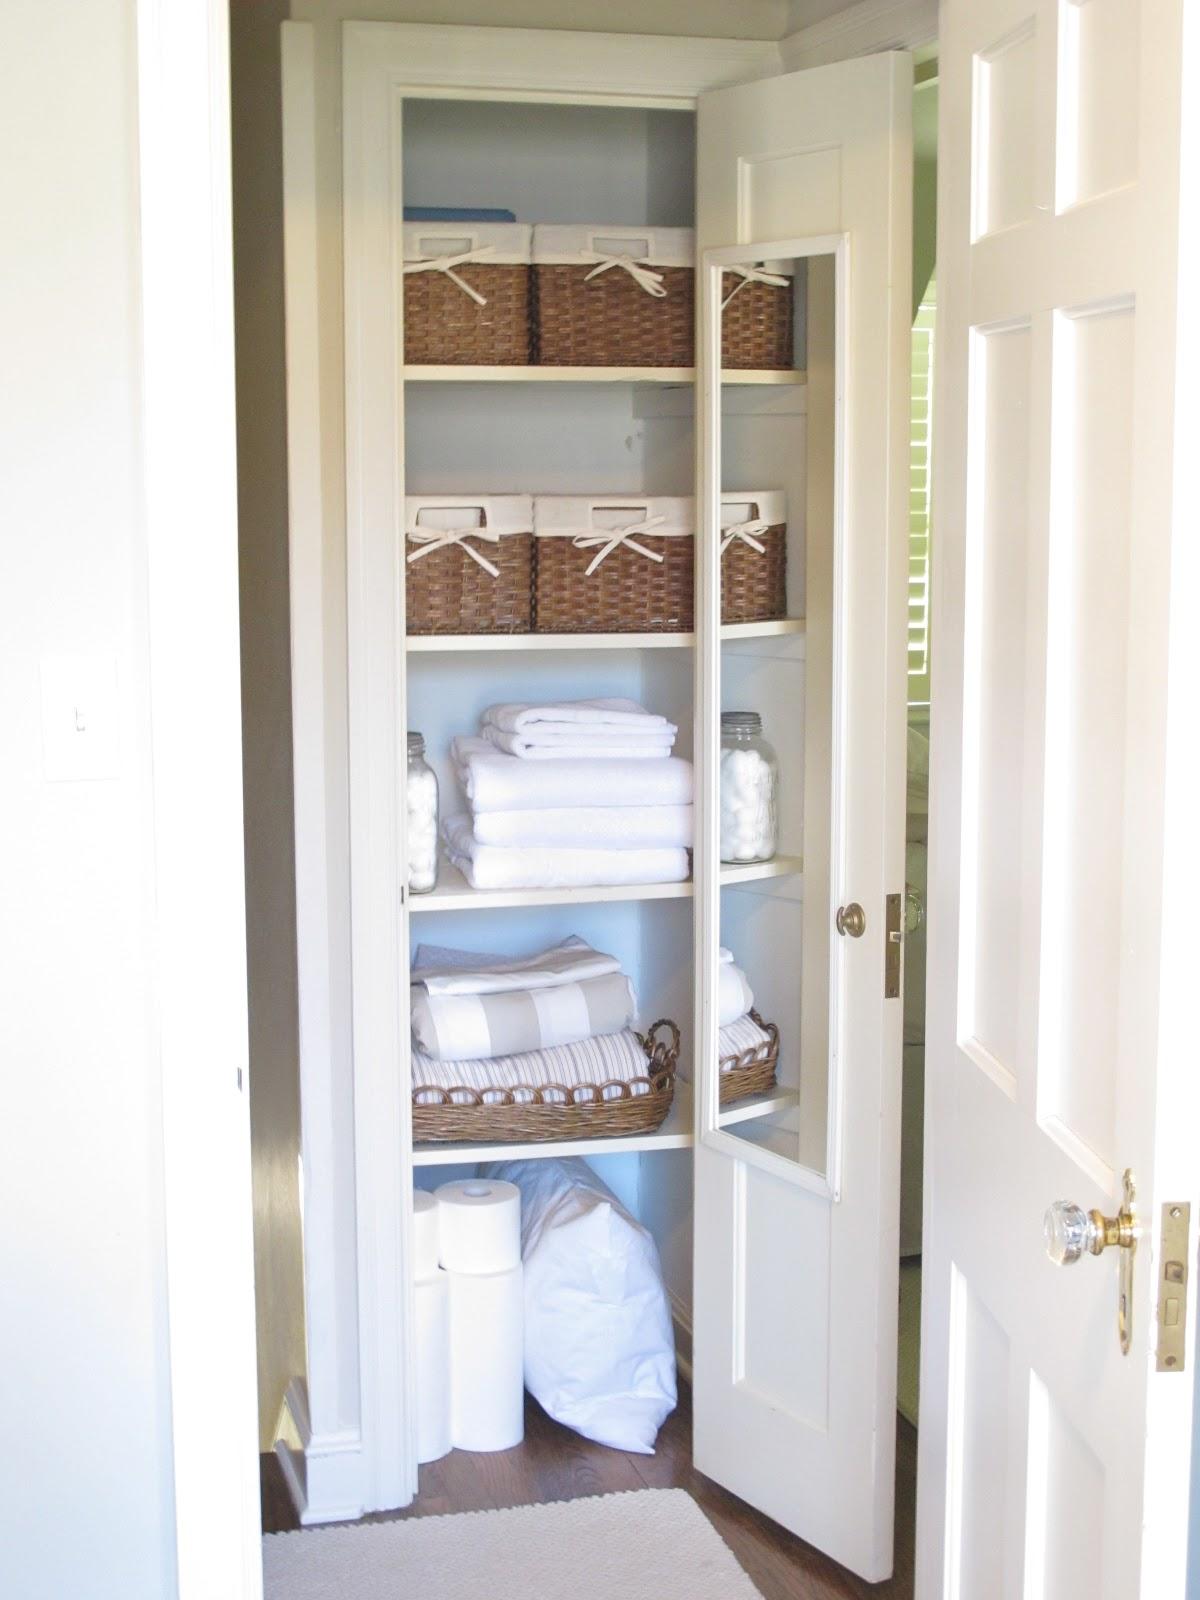 closet your space s baskets area neaten kid details kids nest play